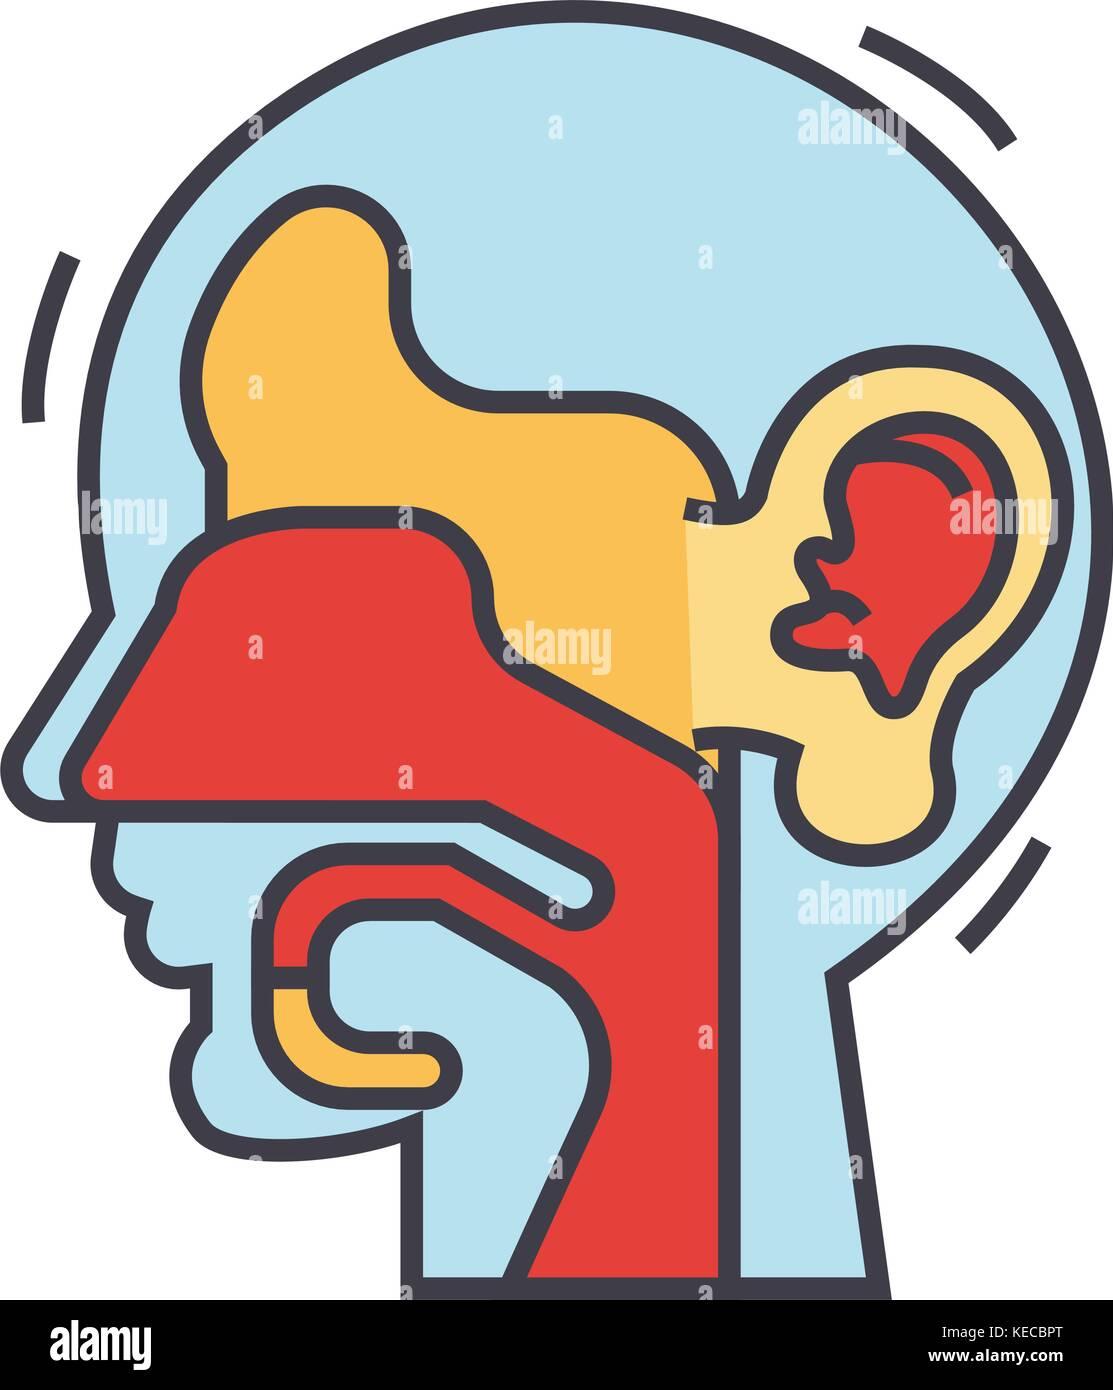 Ear, nose, throat, ent concept.   Stock Vector